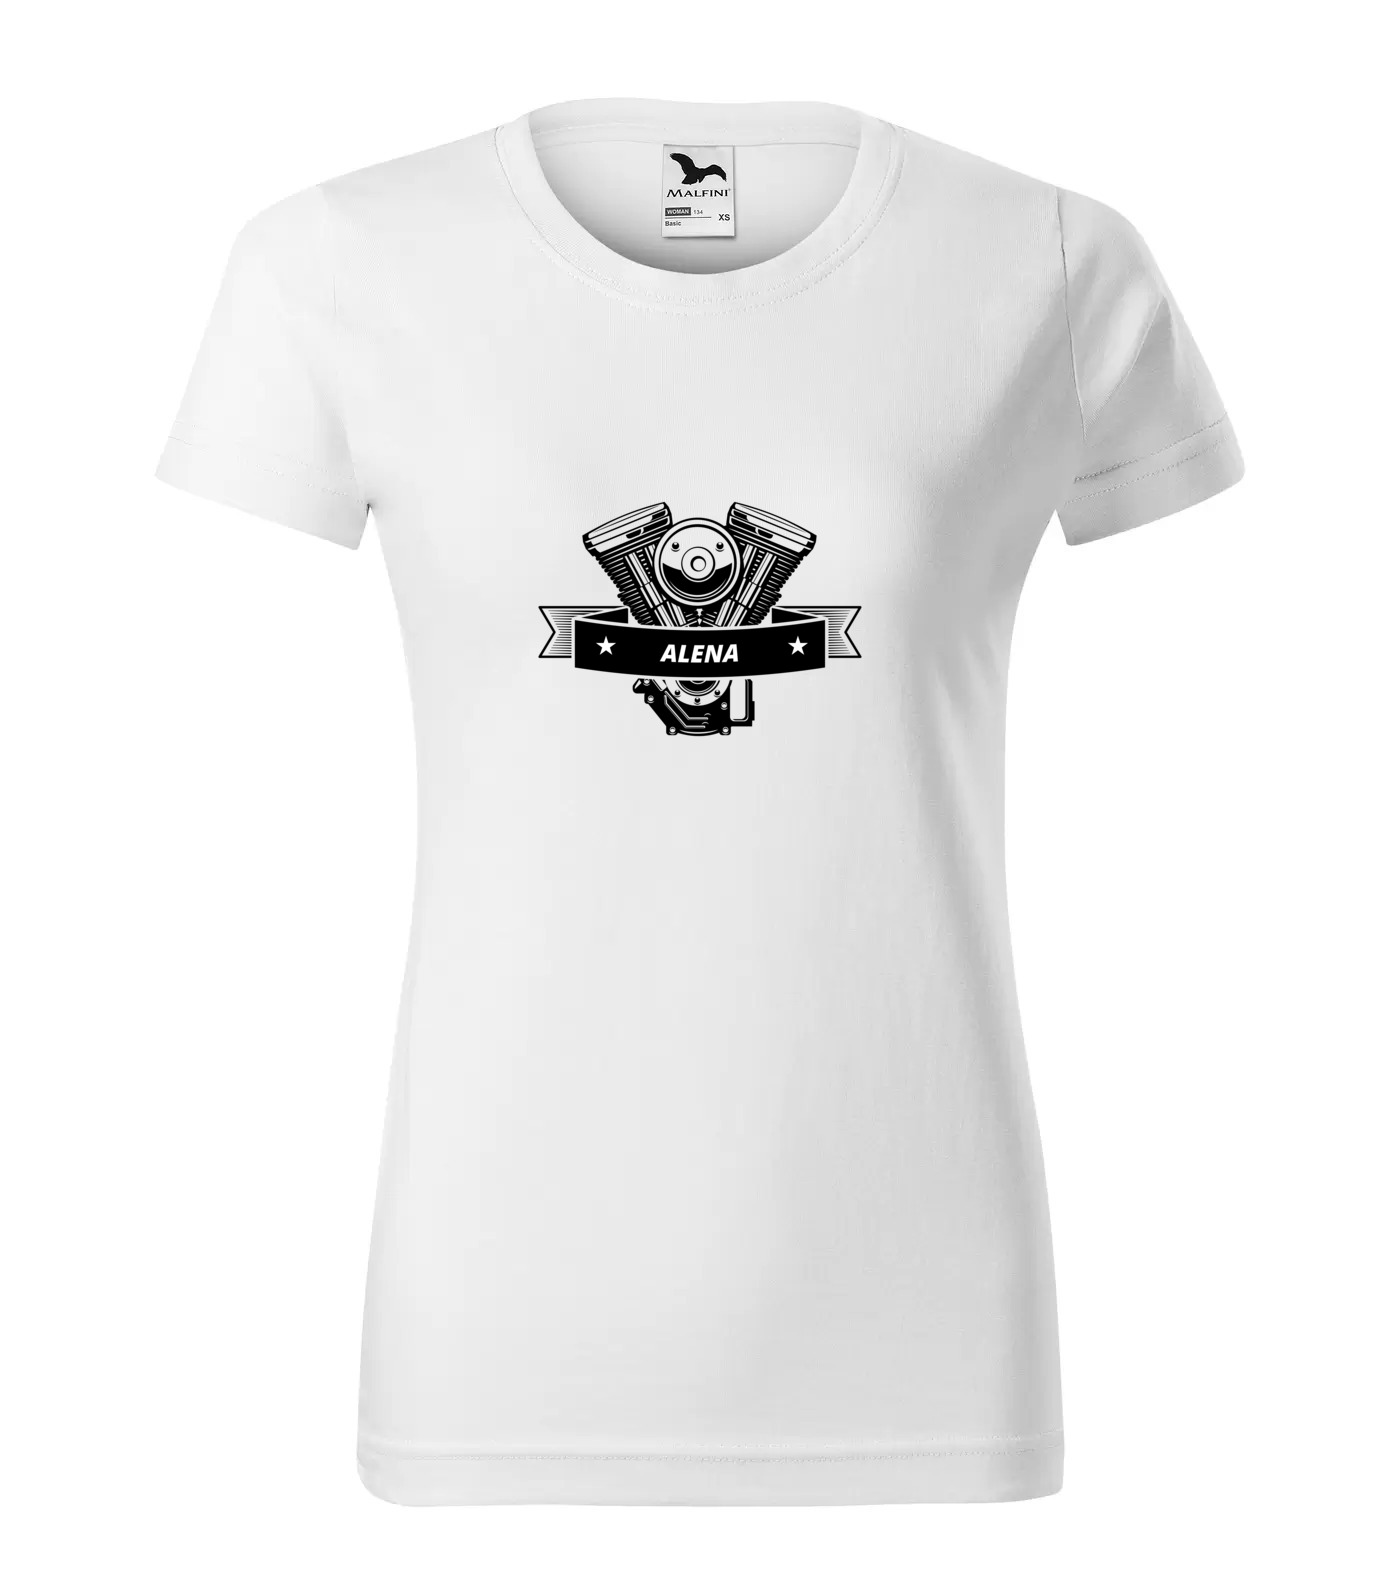 Tričko Motorkářka Alena